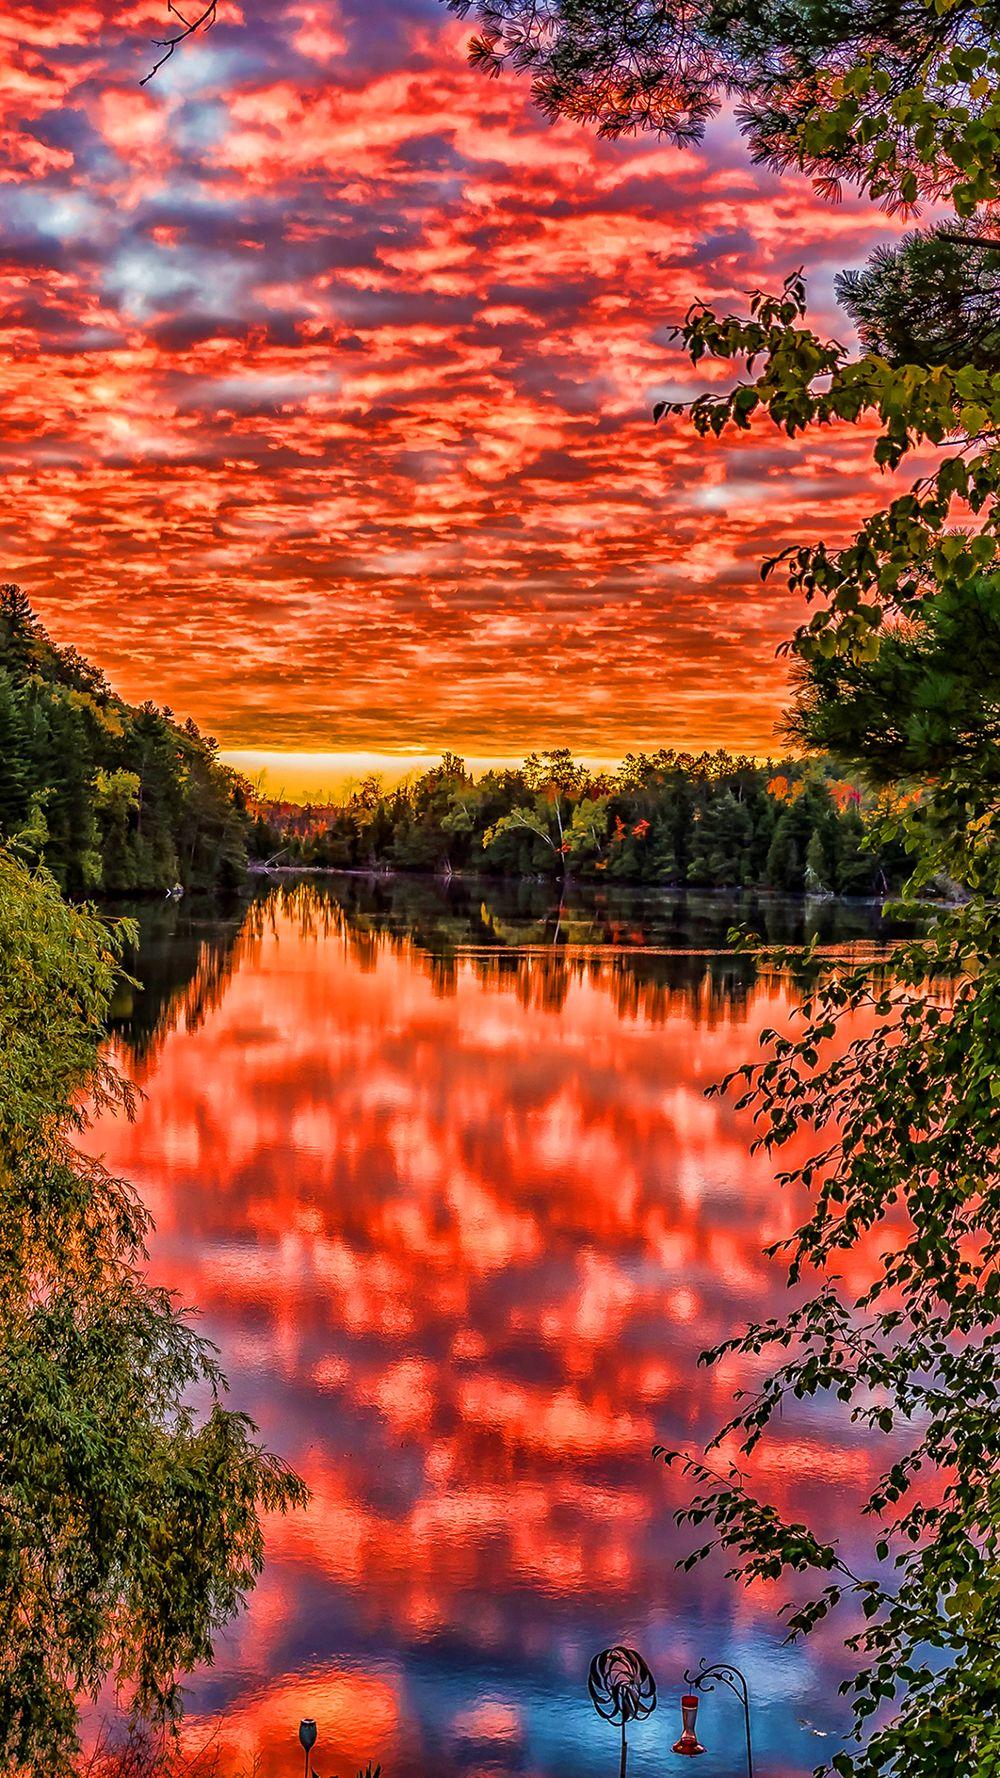 High Resolution Orange Sky Sunset Lake Green Trees